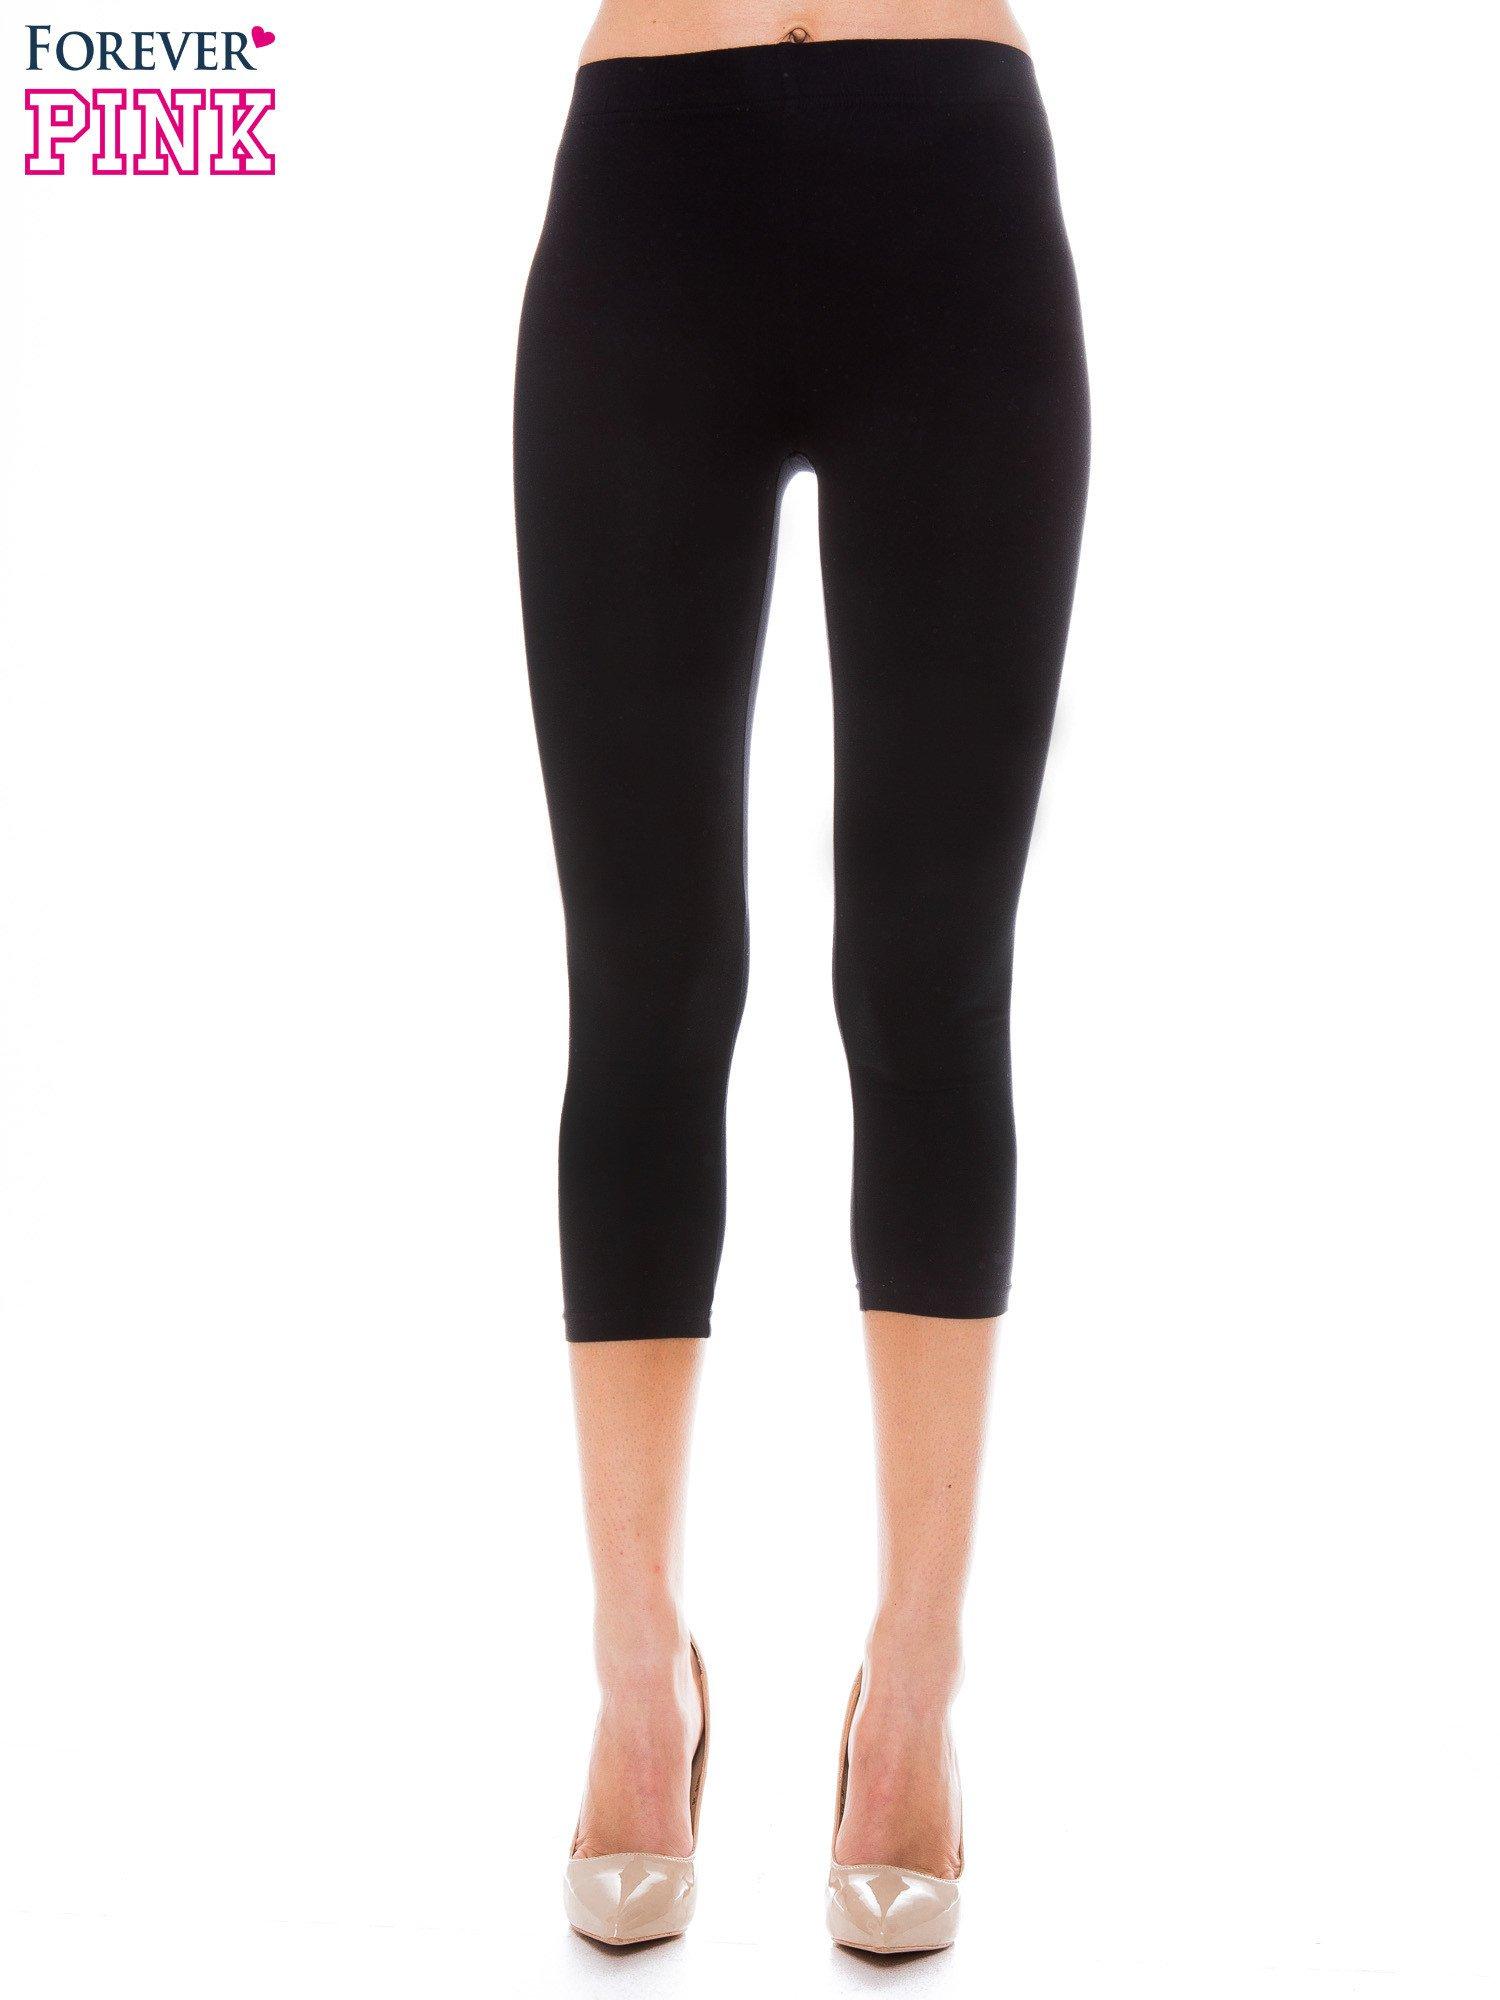 3a1d535e0eff0b Czarne bawełniane legginsy 3/4 - Spodnie legginsy - sklep eButik.pl